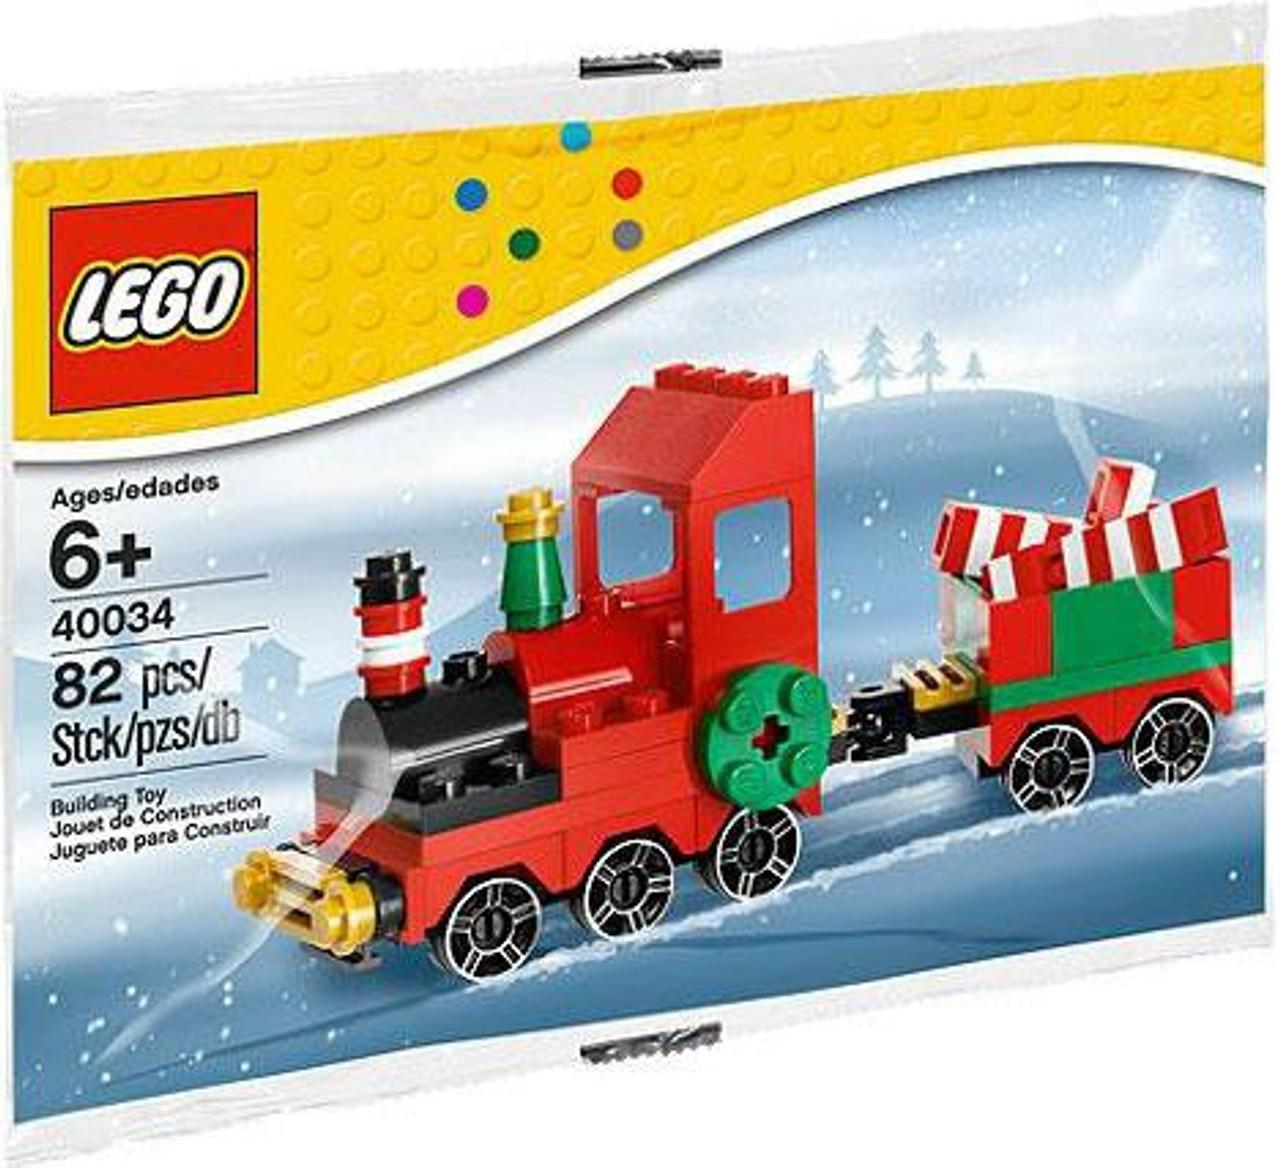 LEGO Christmas Train Mini Set 40034 Bagged - ToyWiz